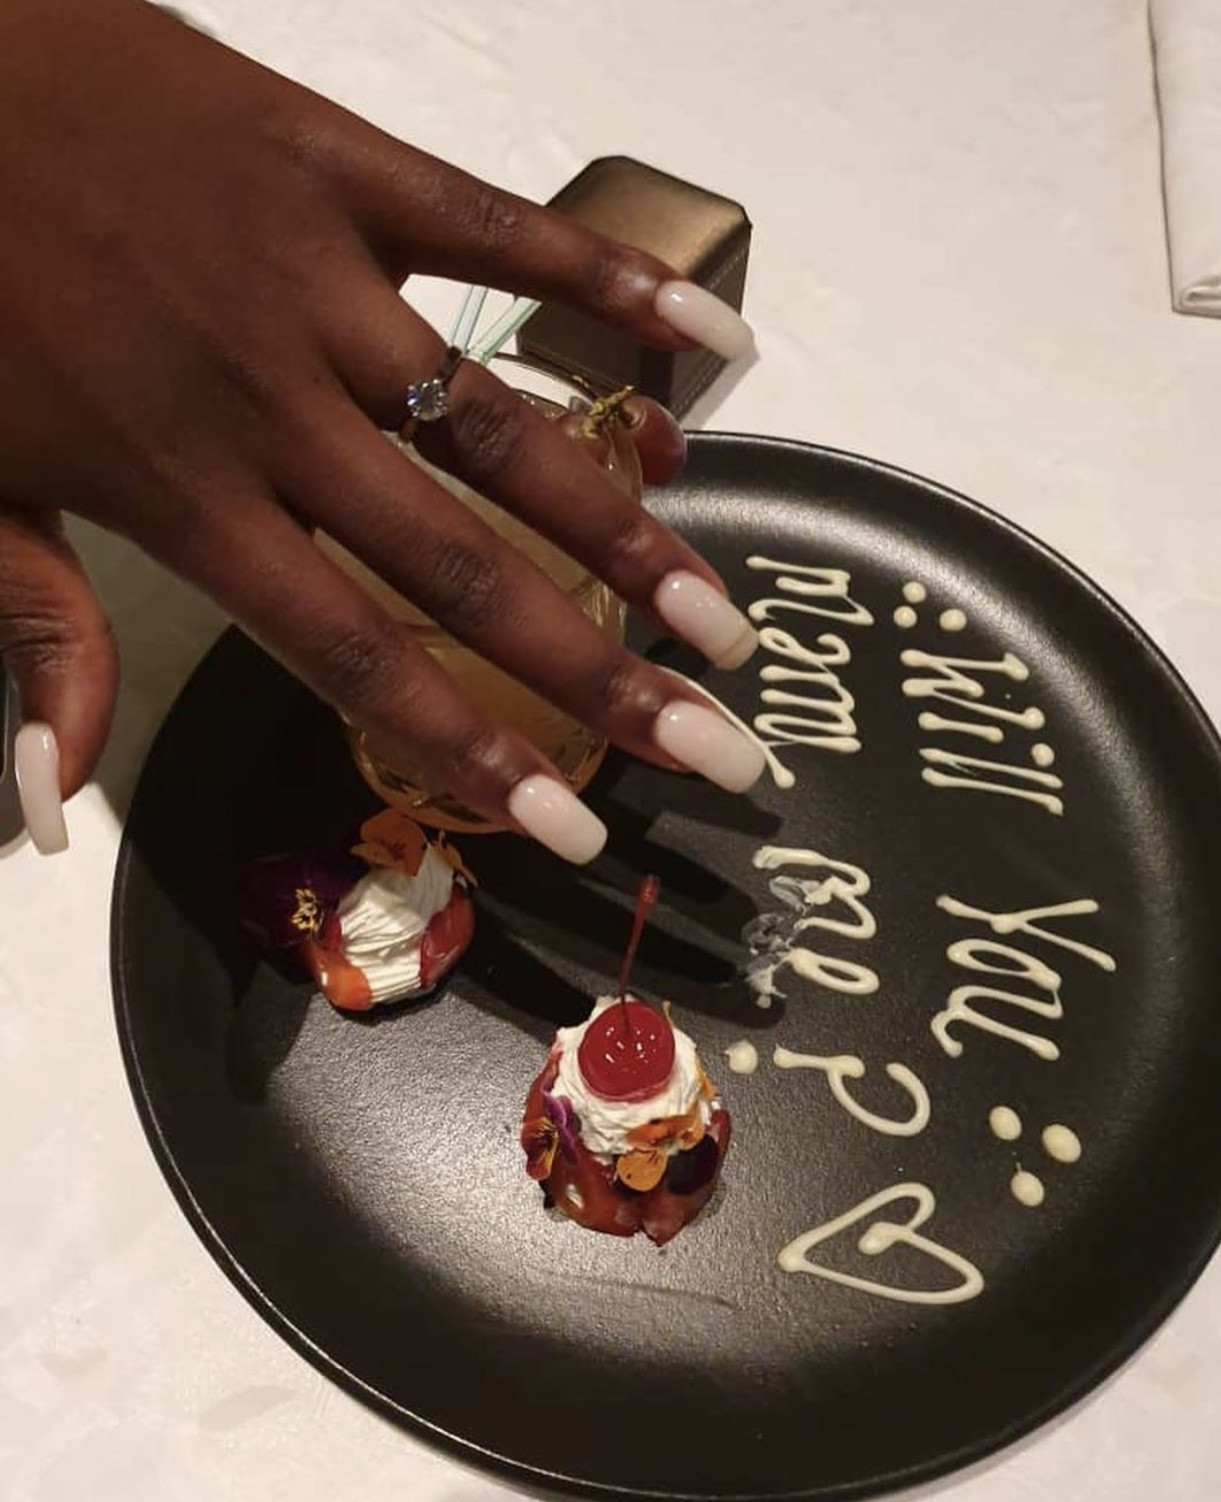 Zimbabwean TV personality Vimbai Mutinhiri & boyfriend, Dru Ekpenyong, are engaged (photos)